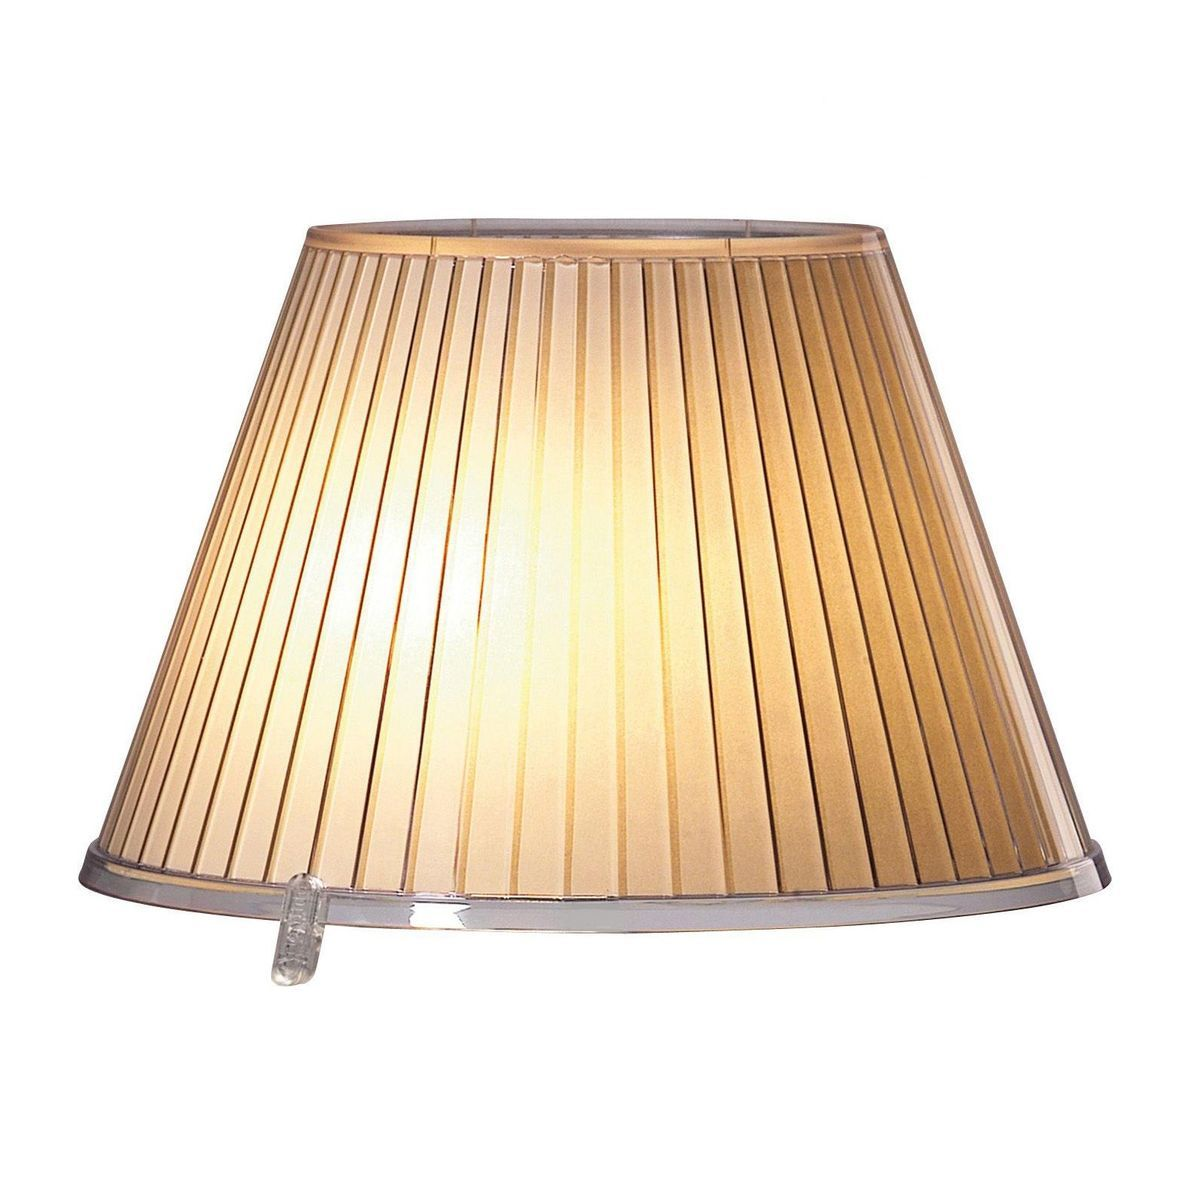 Accessories   spare partsChoose Tavolo Table lamp   Artemide   AmbienteDirect com. Artemide Lighting Spare Parts. Home Design Ideas